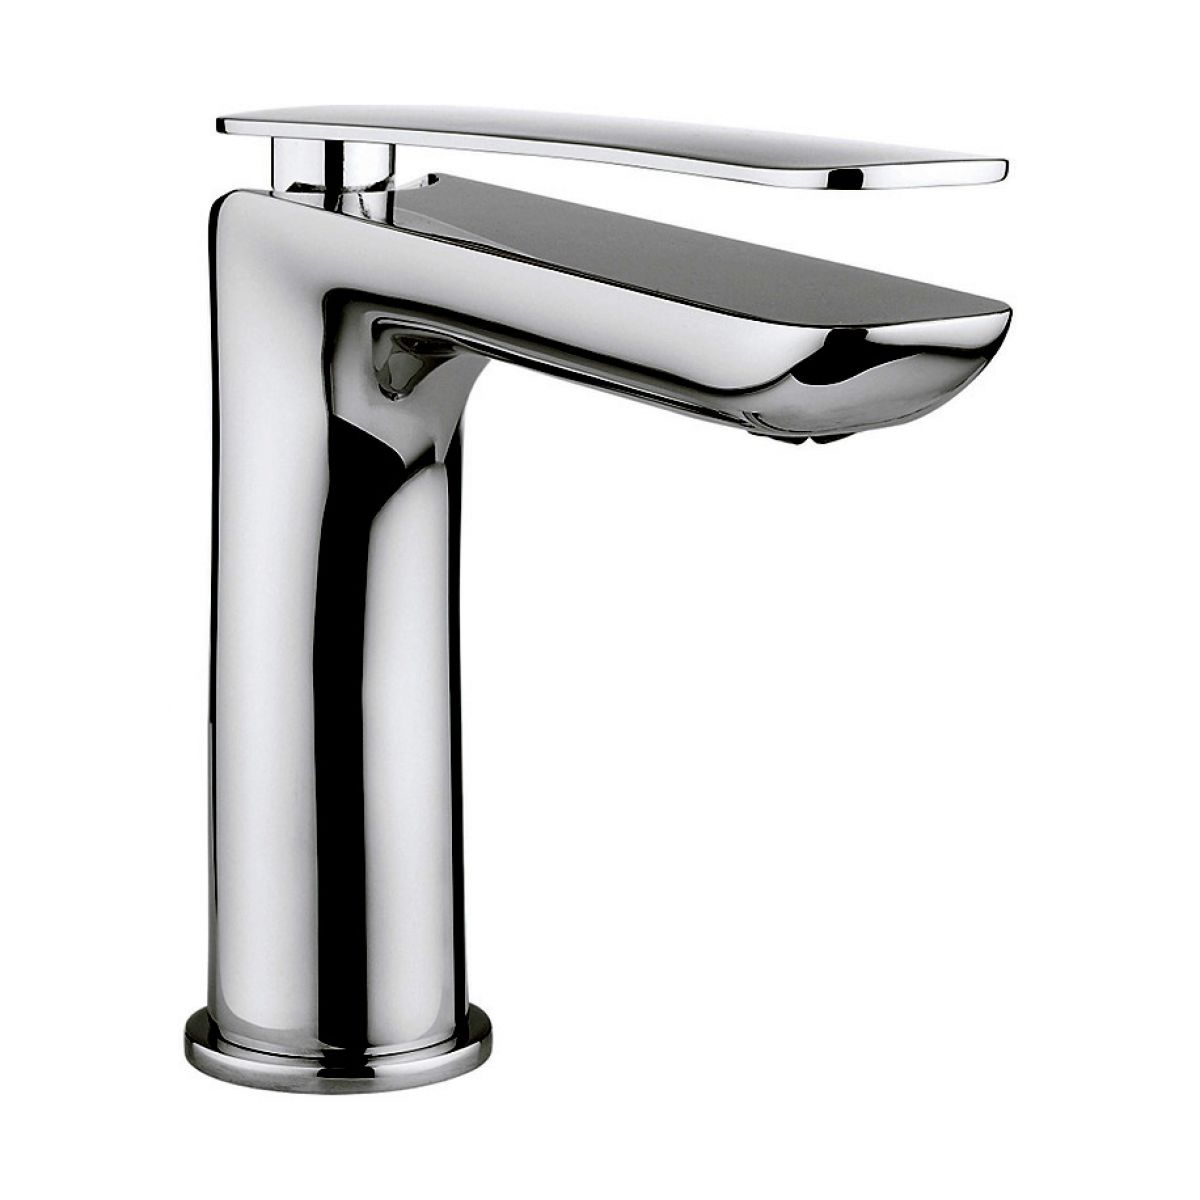 Bathroom Sink Mixer Taps Uk. copper taps basin taps shower heads ...